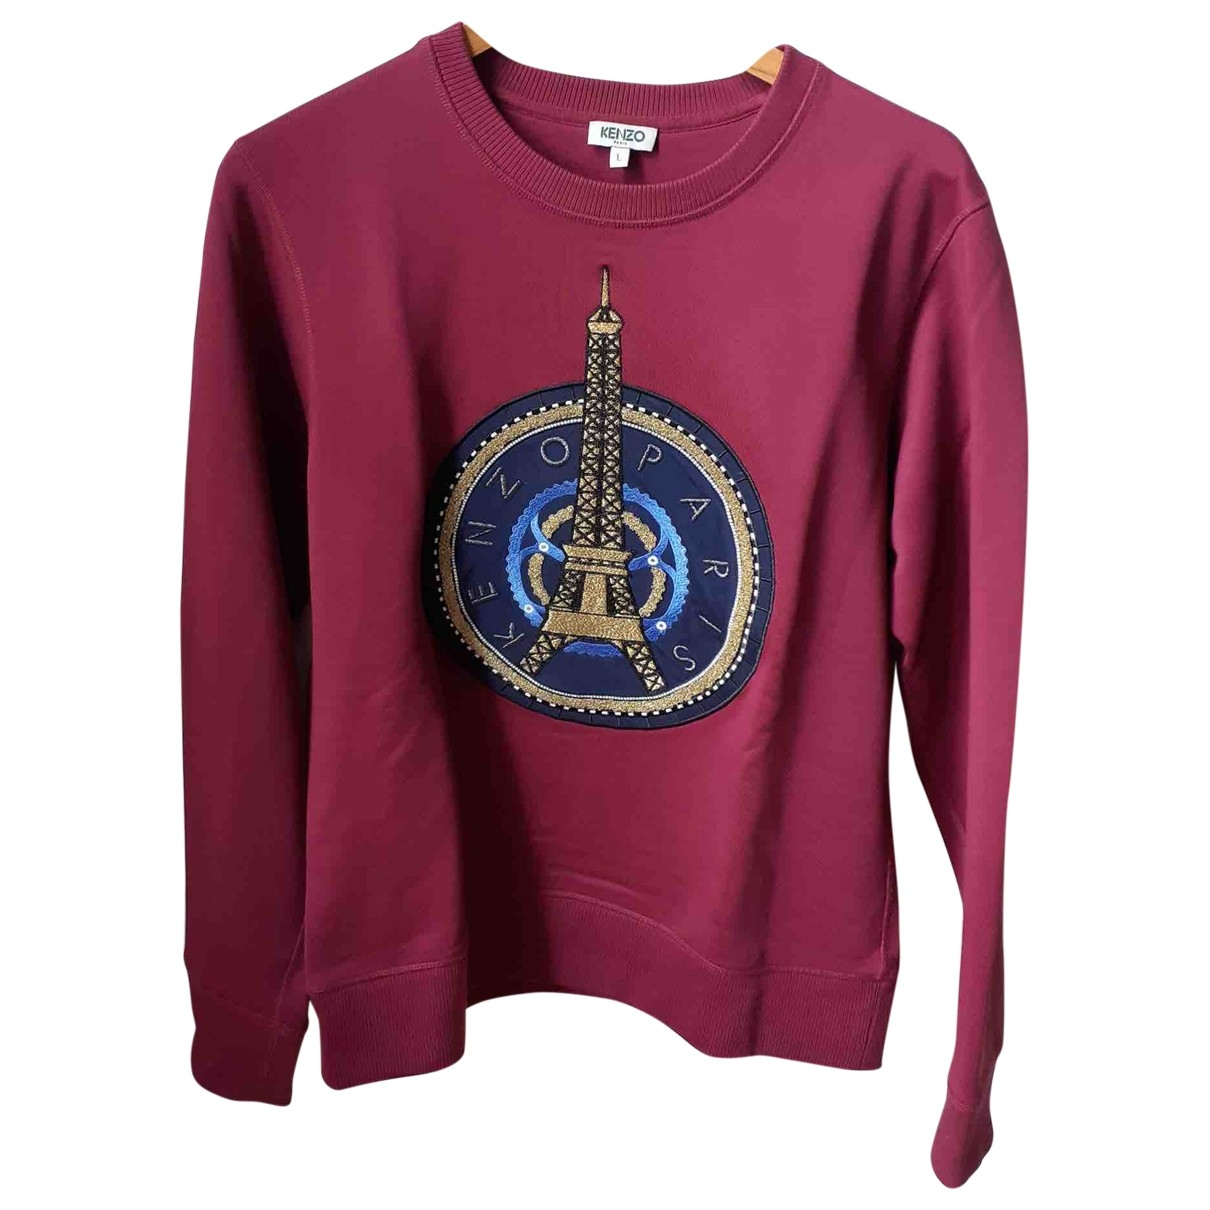 Kenzo \N Burgundy Cotton Knitwear & Sweatshirts for Men M International